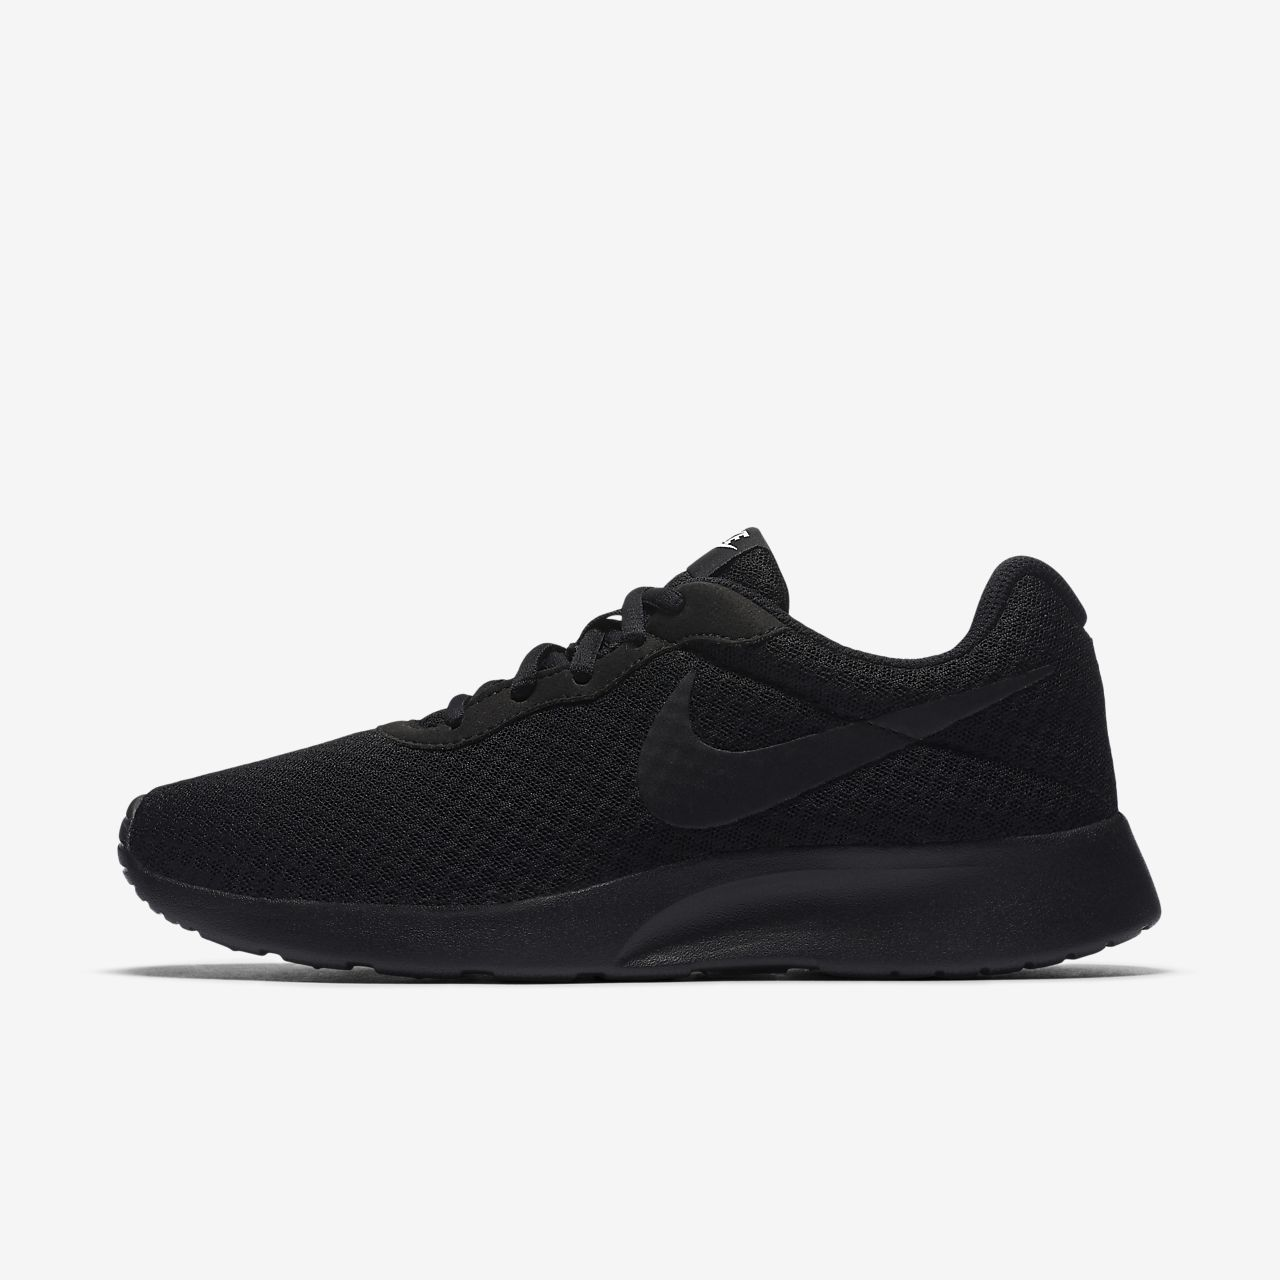 Dámská bota Nike Tanjun